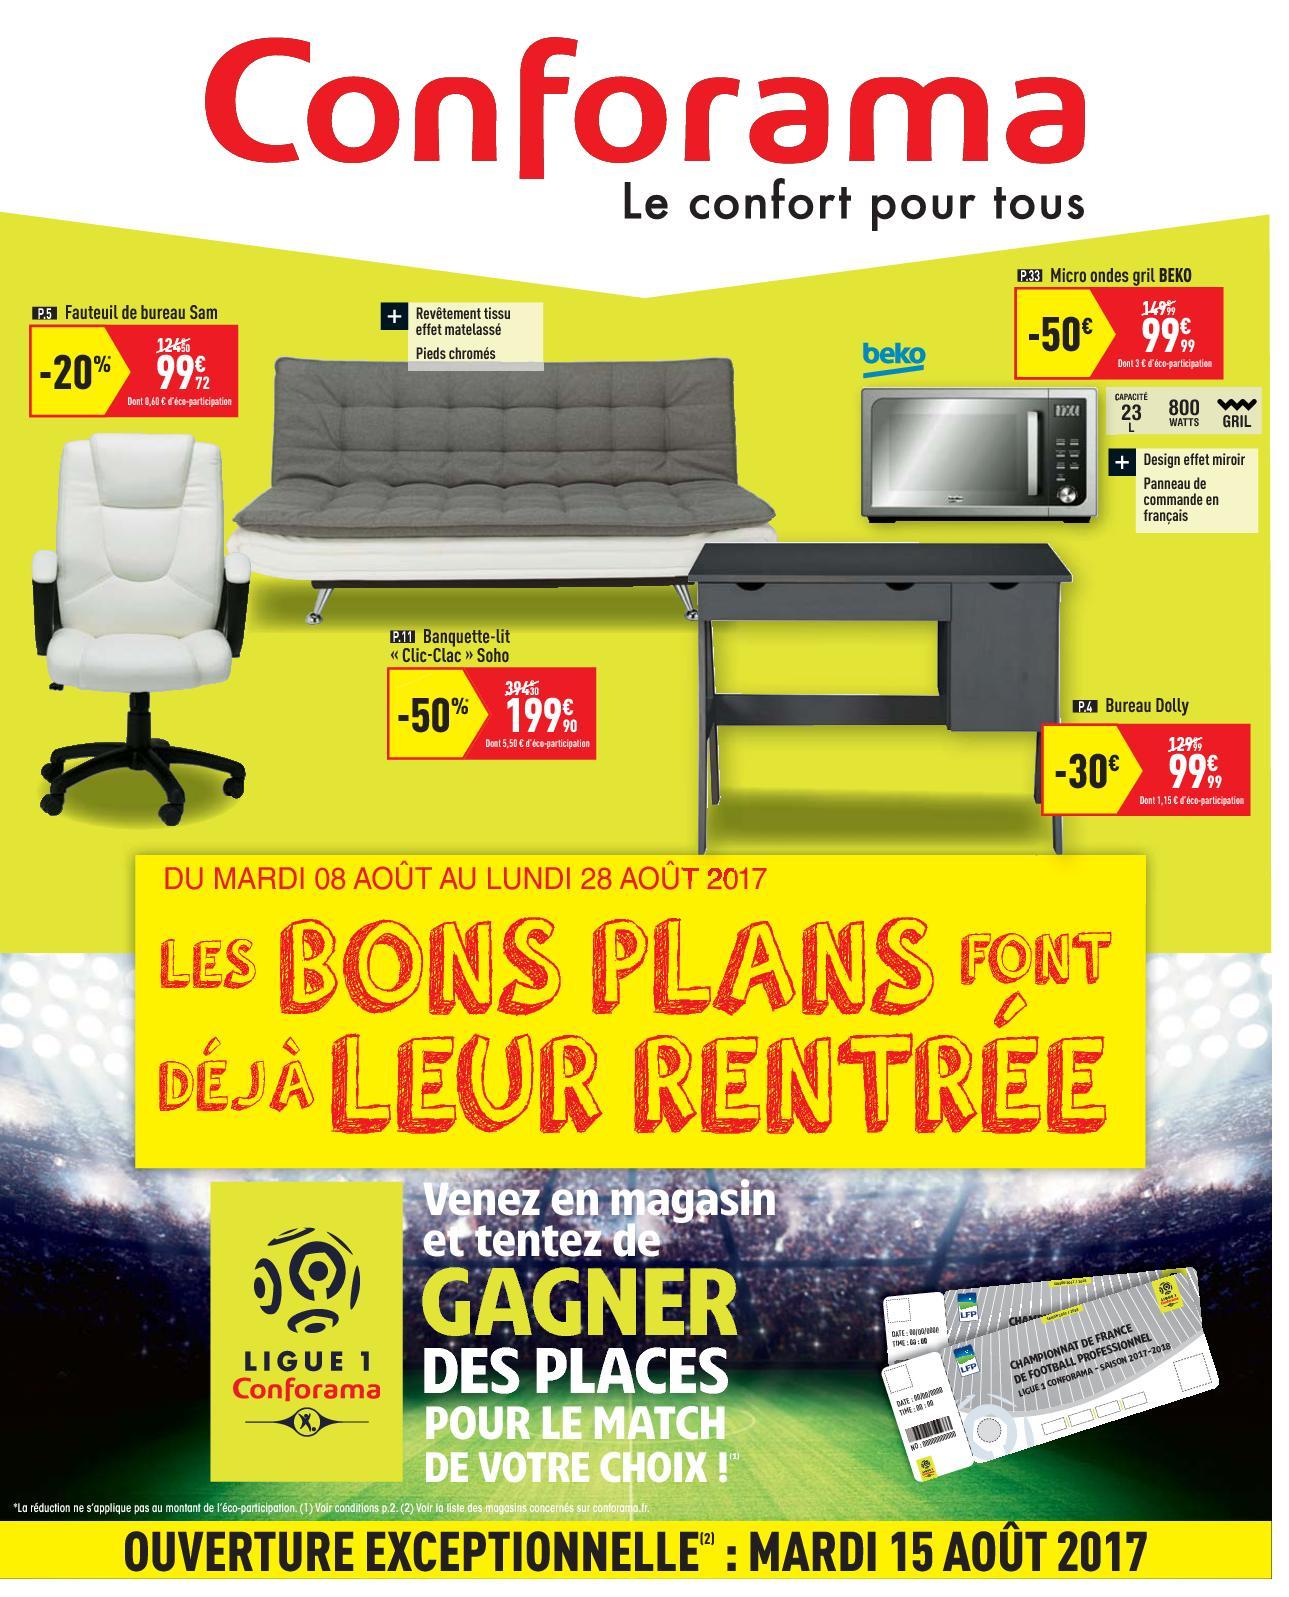 Calaméo - Conforama, Catalogue Rentree 2017 tout Canapé Chelsea Conforama